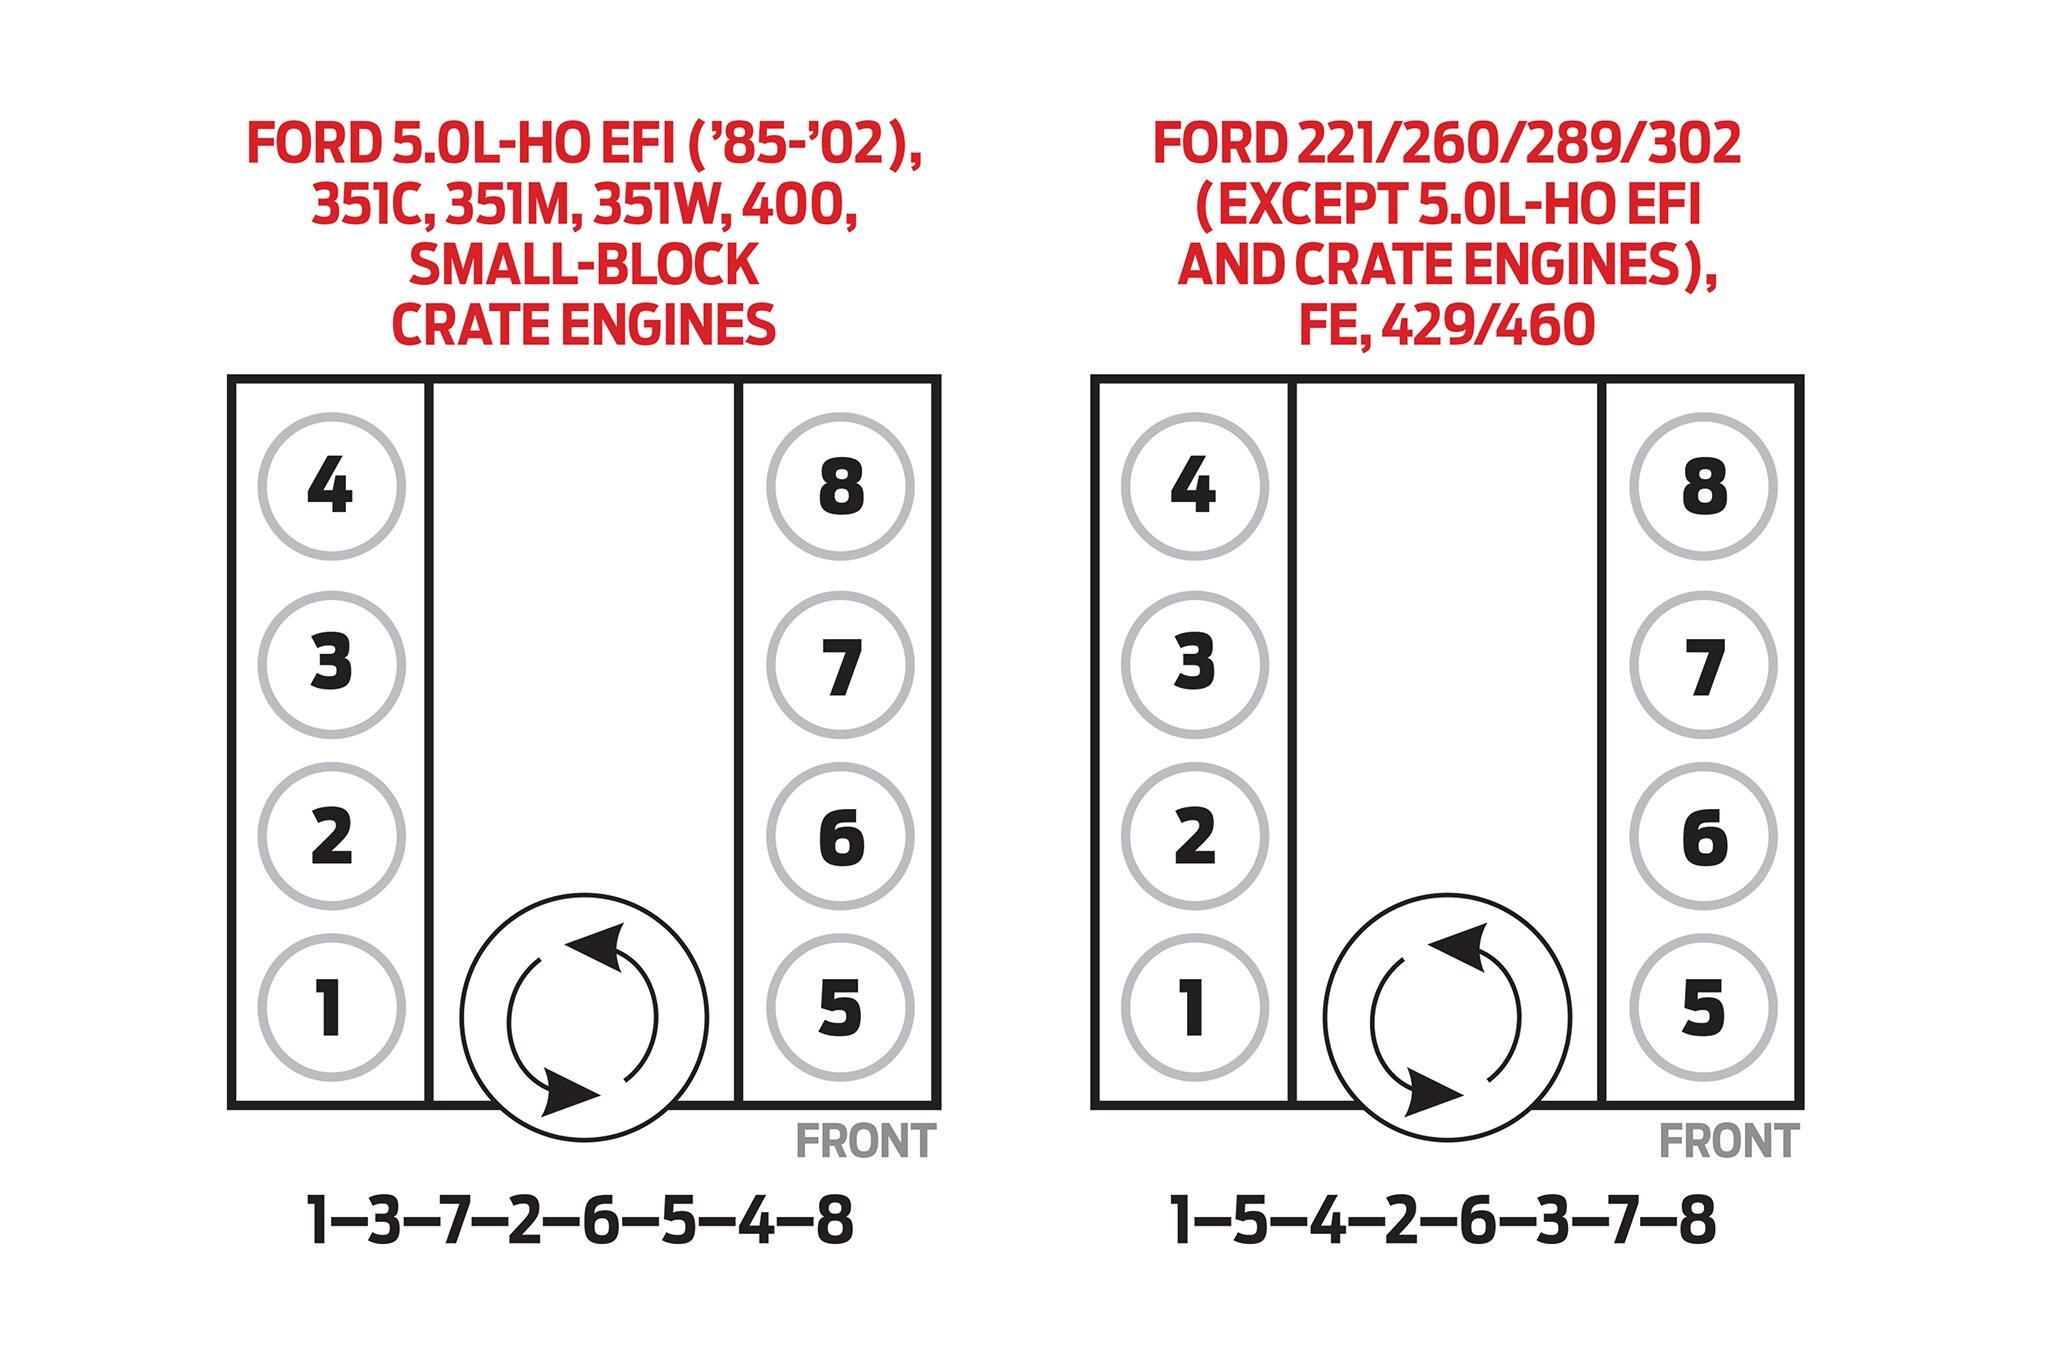 Ford 460 Plug Wire Diagram - 25 Hp Kohler Engine Wiring